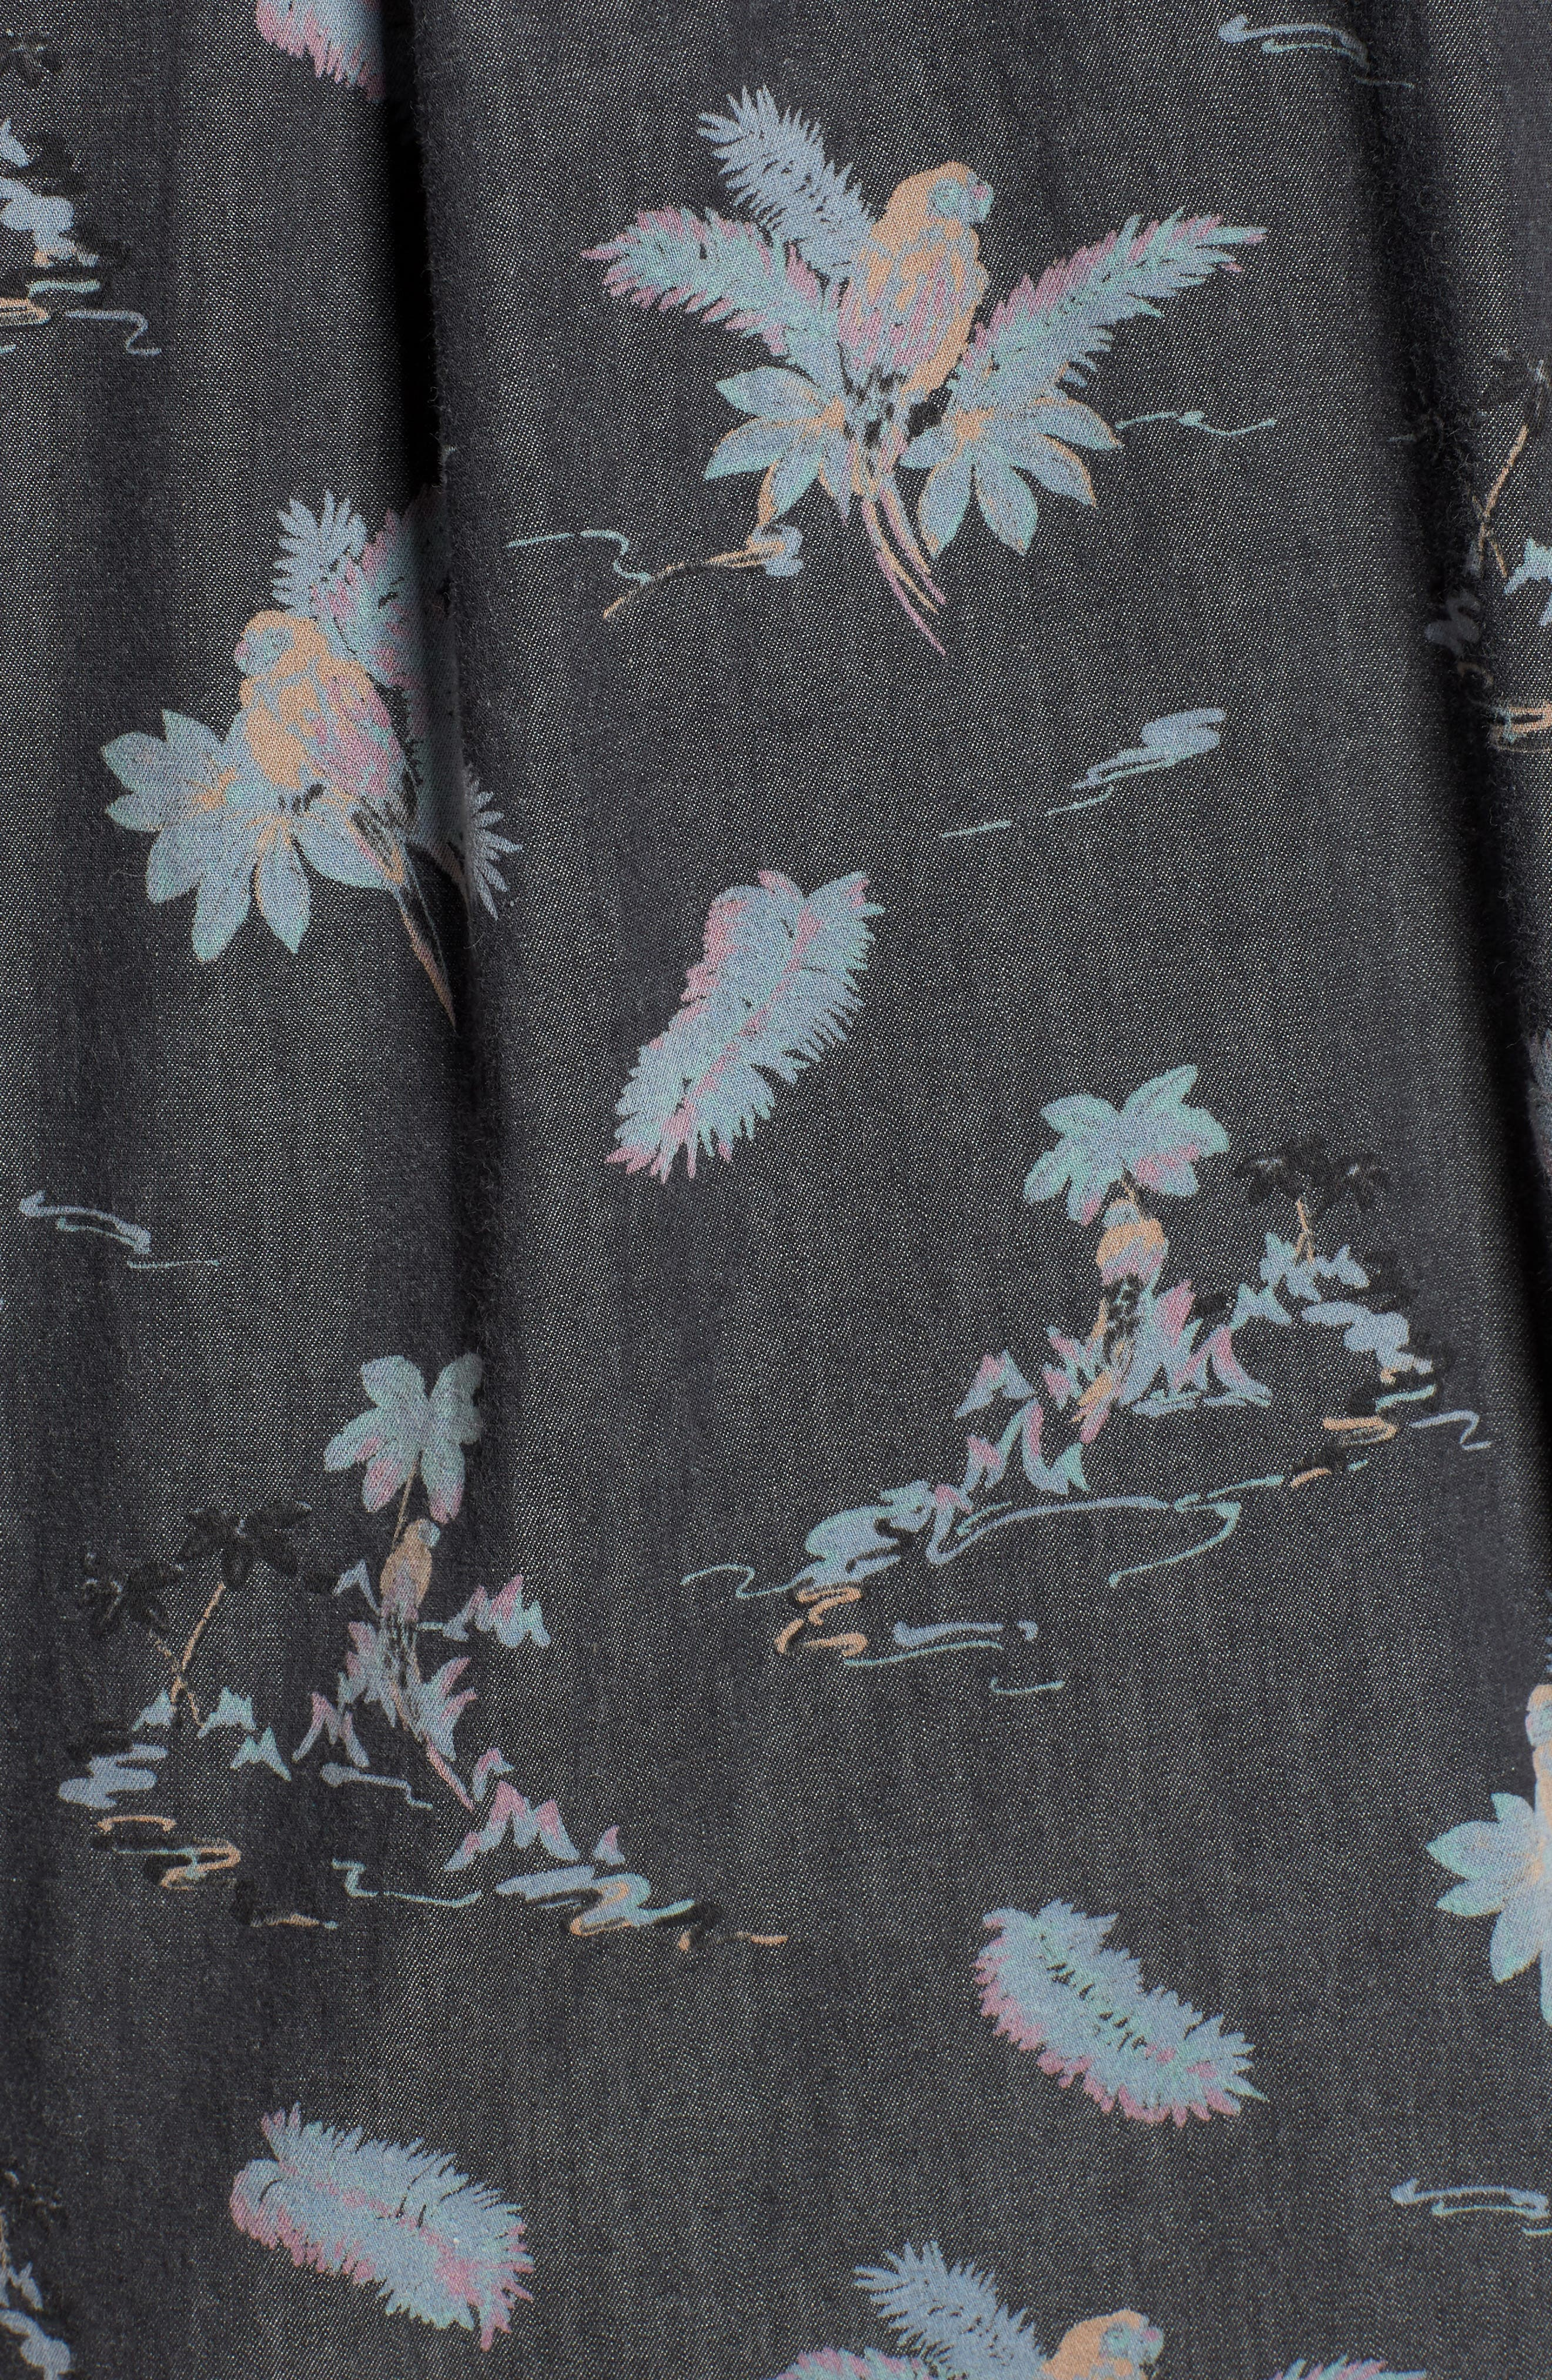 Meledrone Woven Shirt,                             Alternate thumbnail 5, color,                             Charcoal Grey